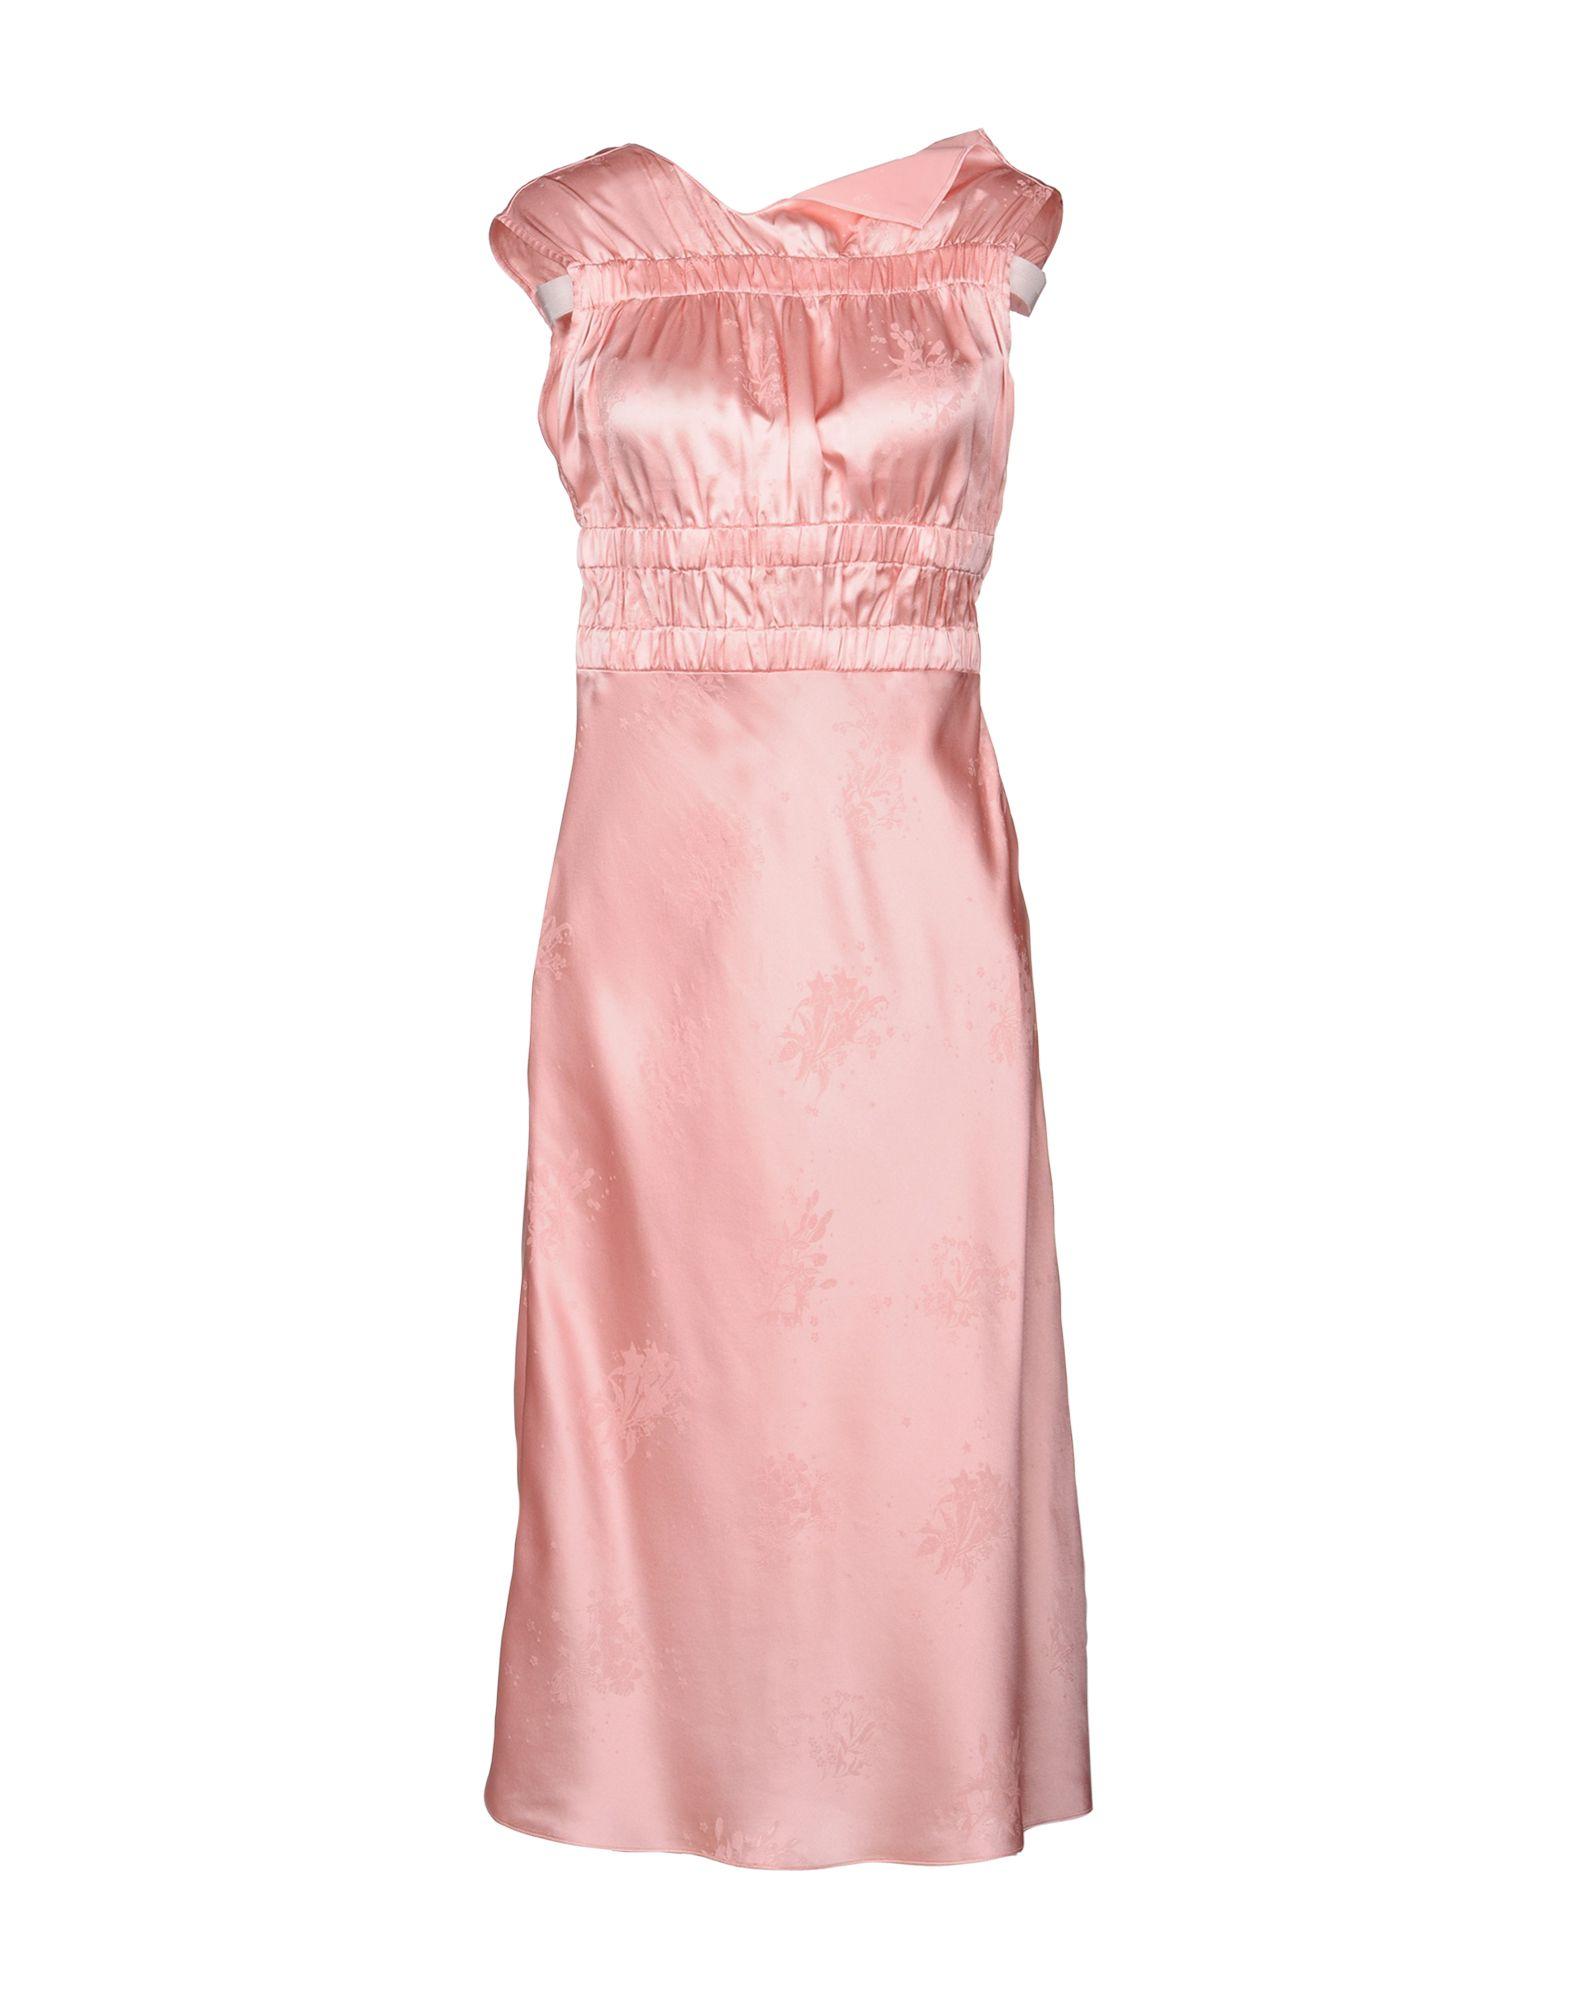 TOPSHOP UNIQUE Knee-Length Dress in Pink